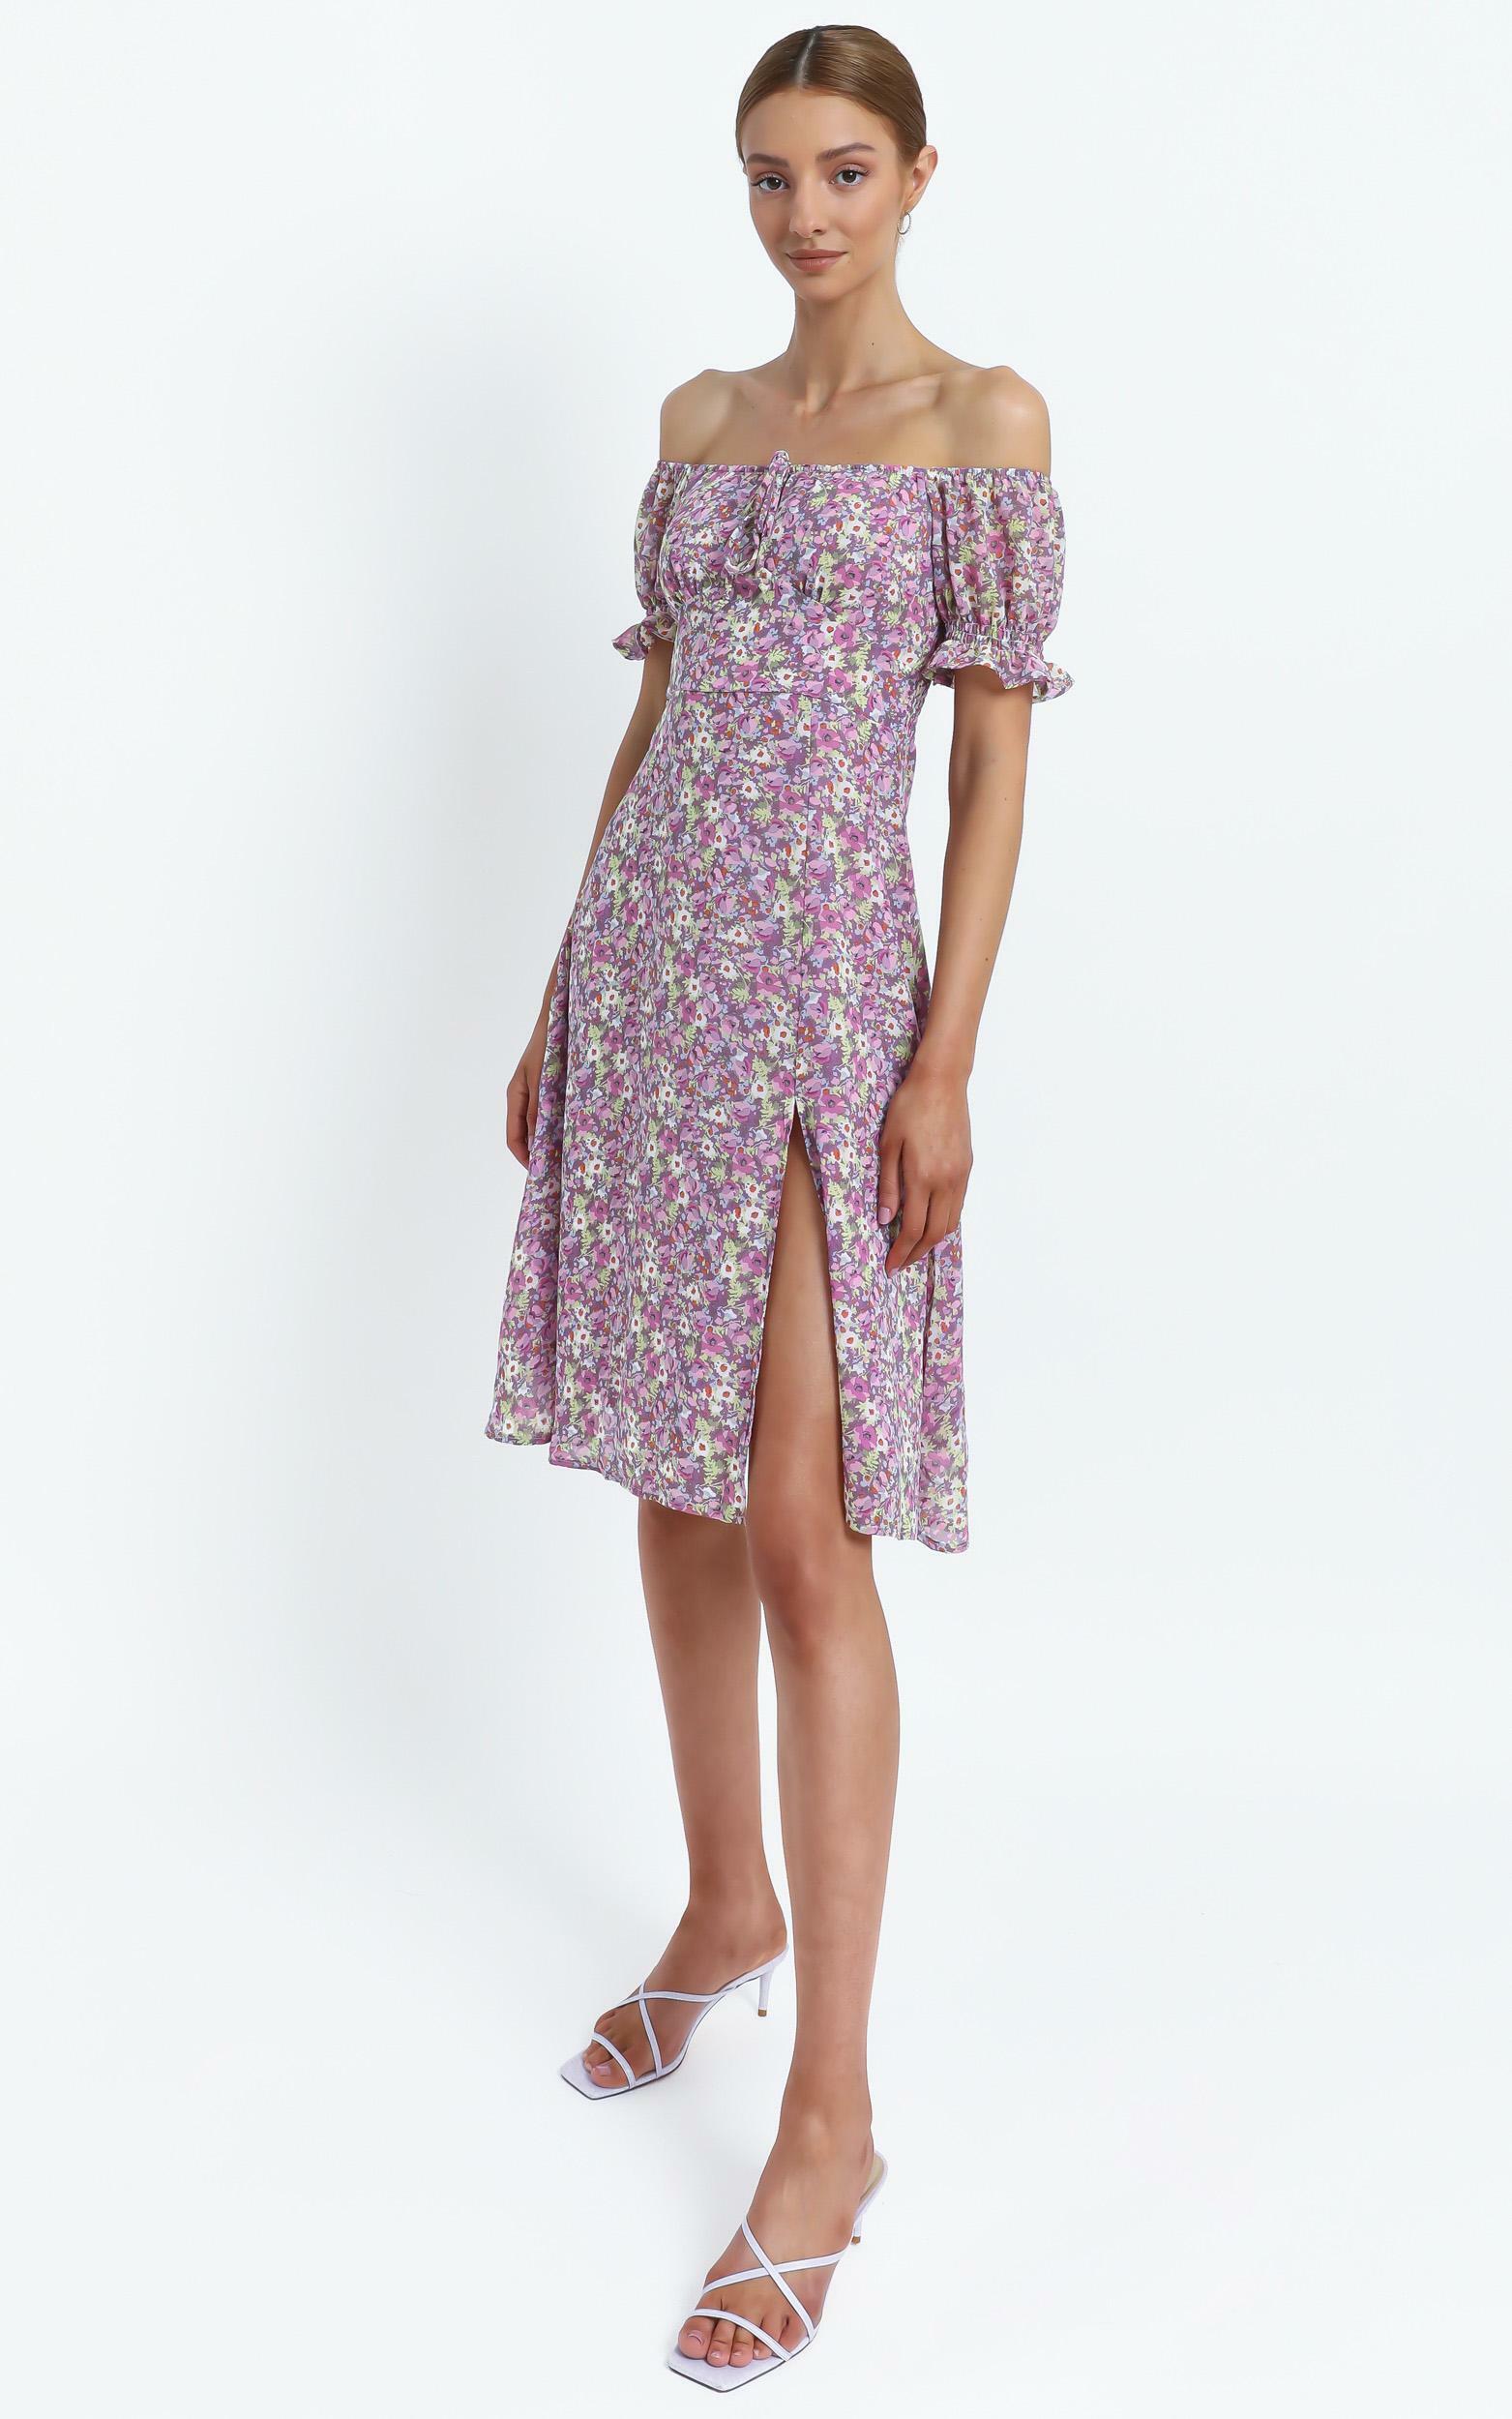 Starley Dress in Pink Floral - 8 (S), Pink, hi-res image number null